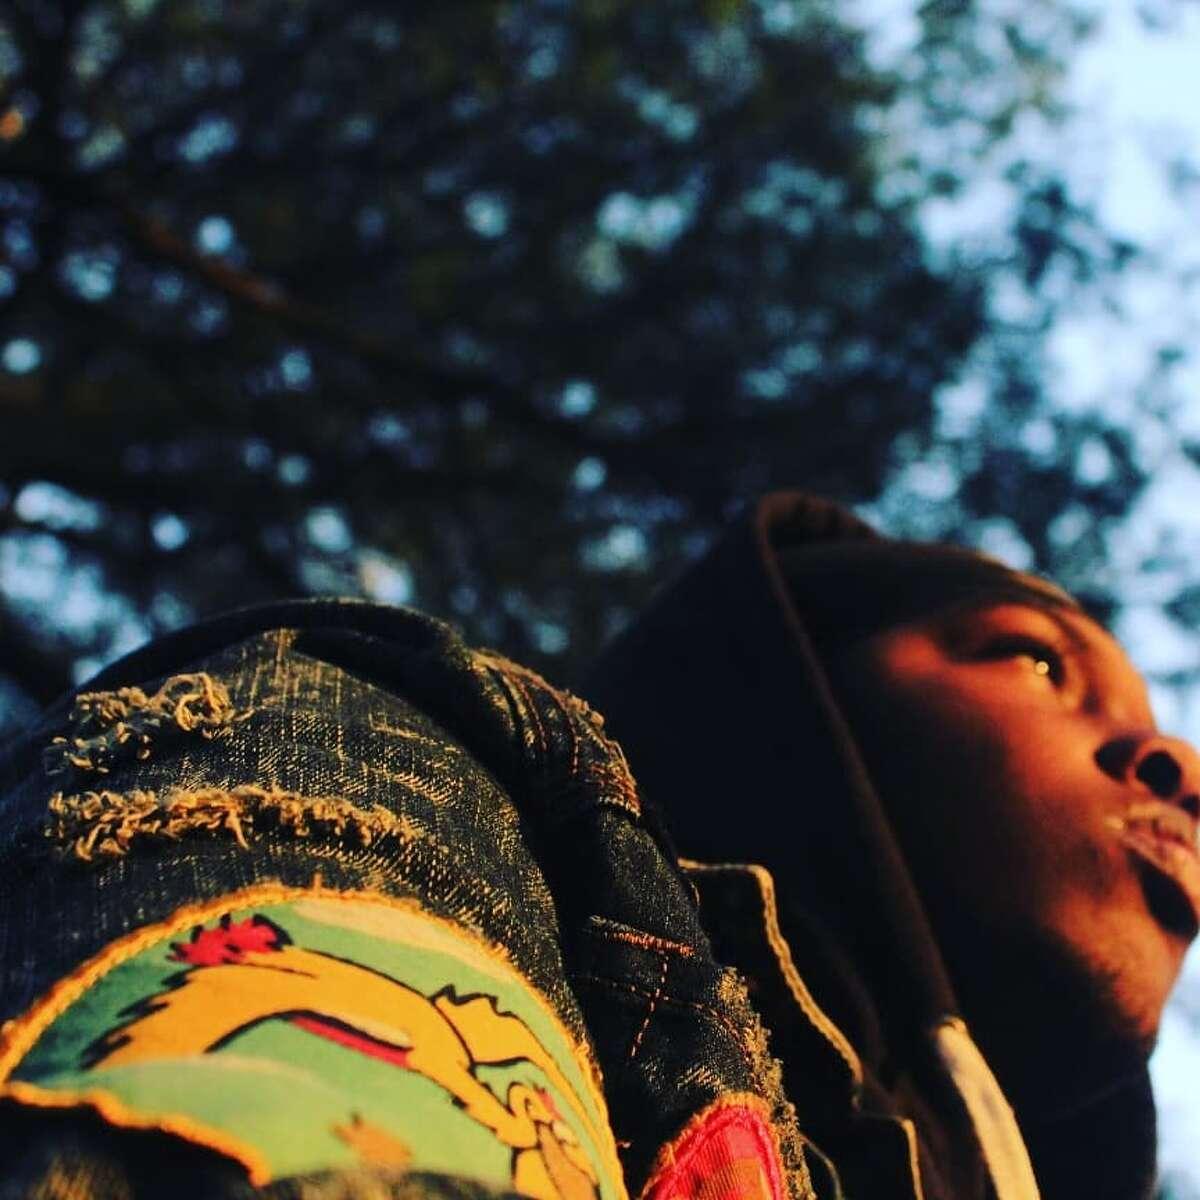 Images from Zanief Washington's Instagram accounts at @yrg_filmworkks and@zanief_youngredhoodie.